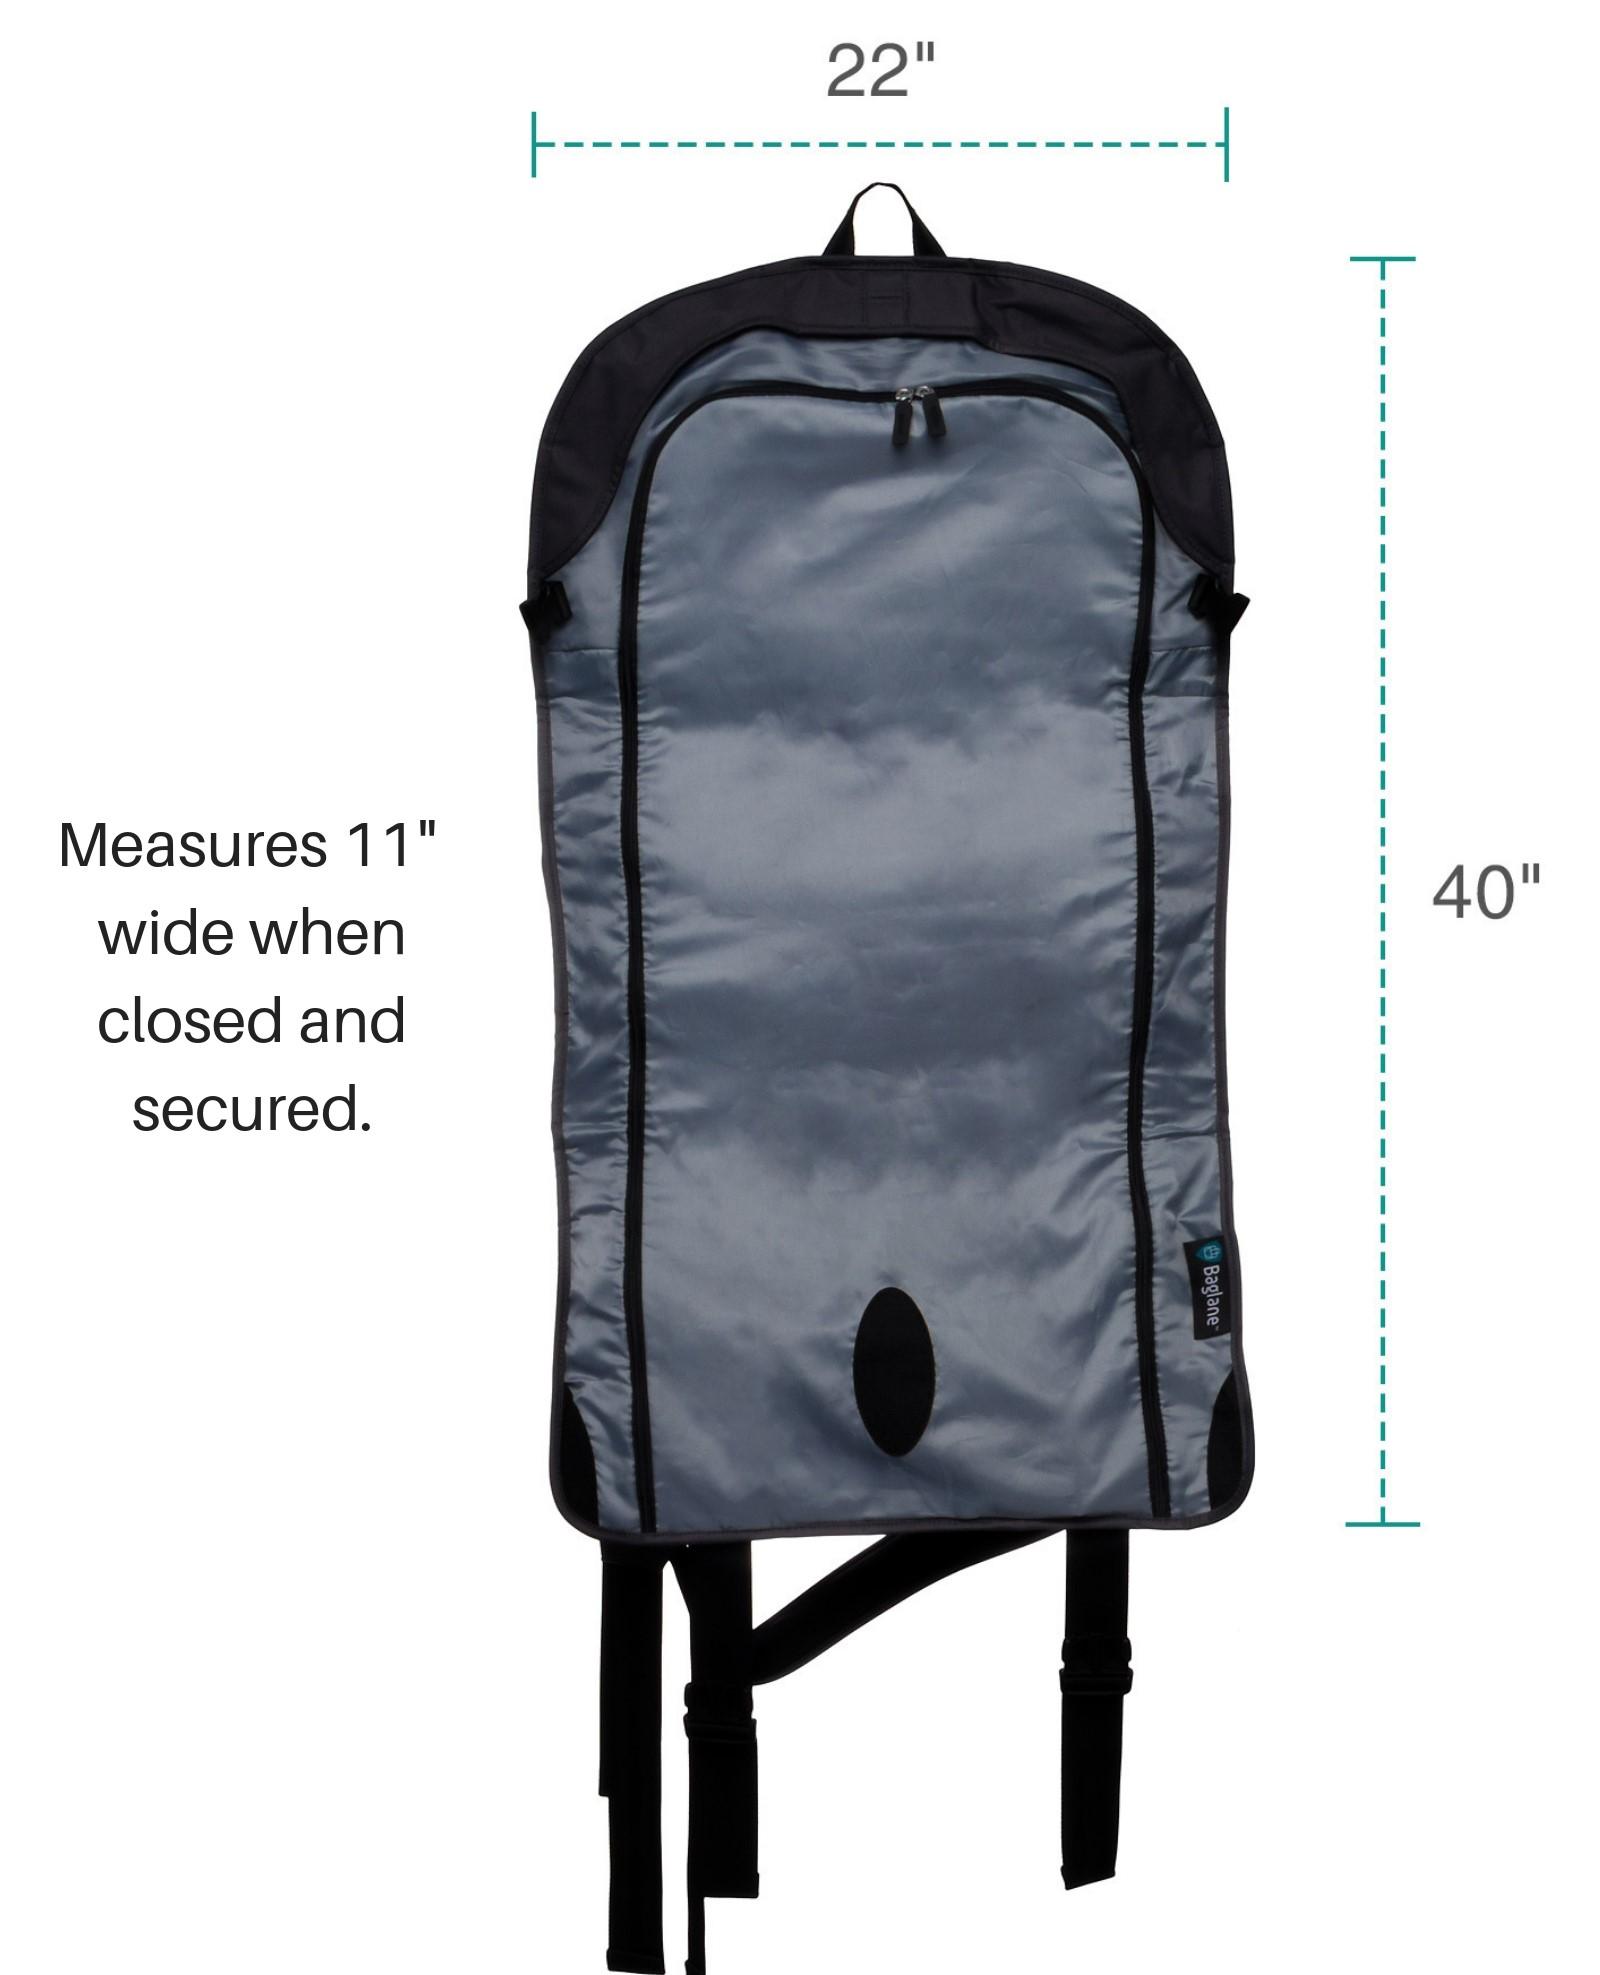 Baglane Canvas Hybrid Commuter Travel Backpack Carry On